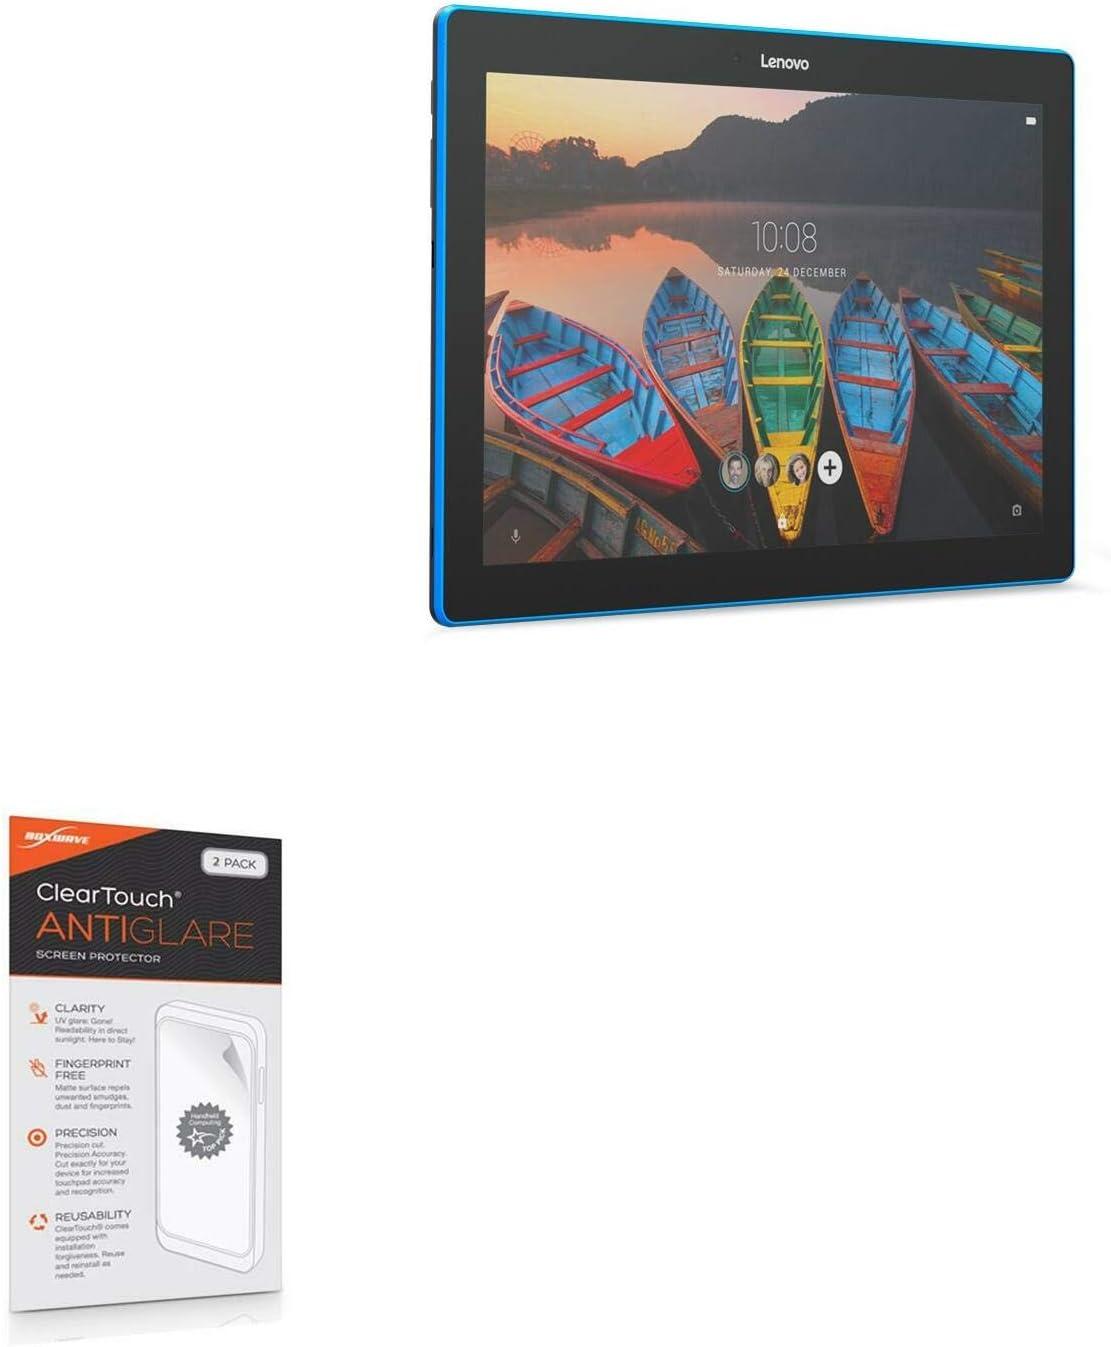 Lenovo TAB 10 TB-X103F Screen Protector, BoxWave [ClearTouch Anti-Glare (2-Pack)] Anti-Fingerprint Matte Film Skin for Lenovo TAB 10 TB-X103F